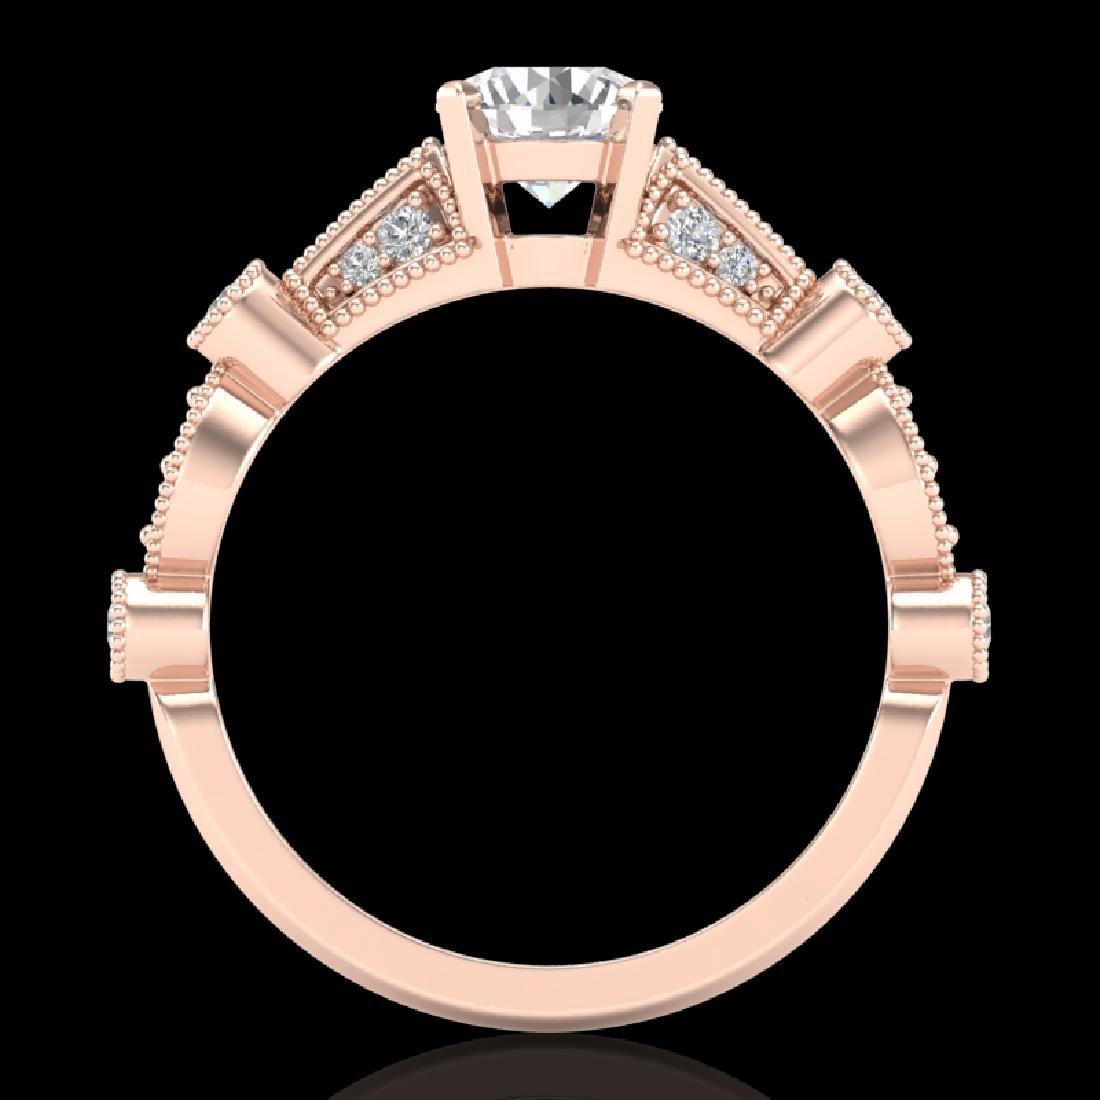 1.03 CTW VS/SI Diamond Solitaire Art Deco Ring 18K Rose